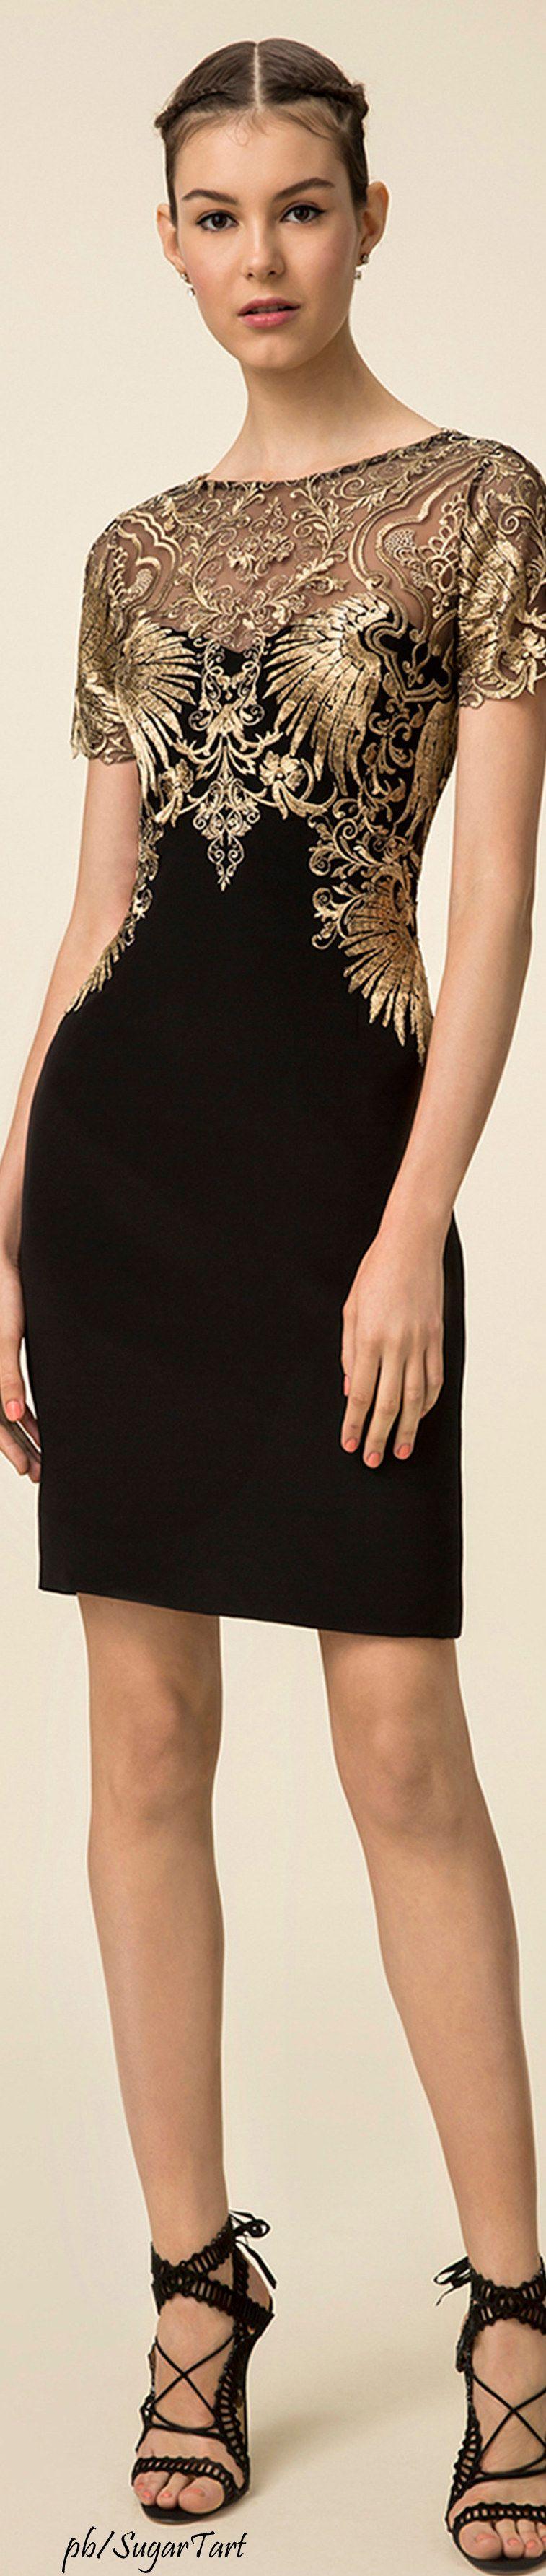 Marchesa notte spring black short lace dress women fashion